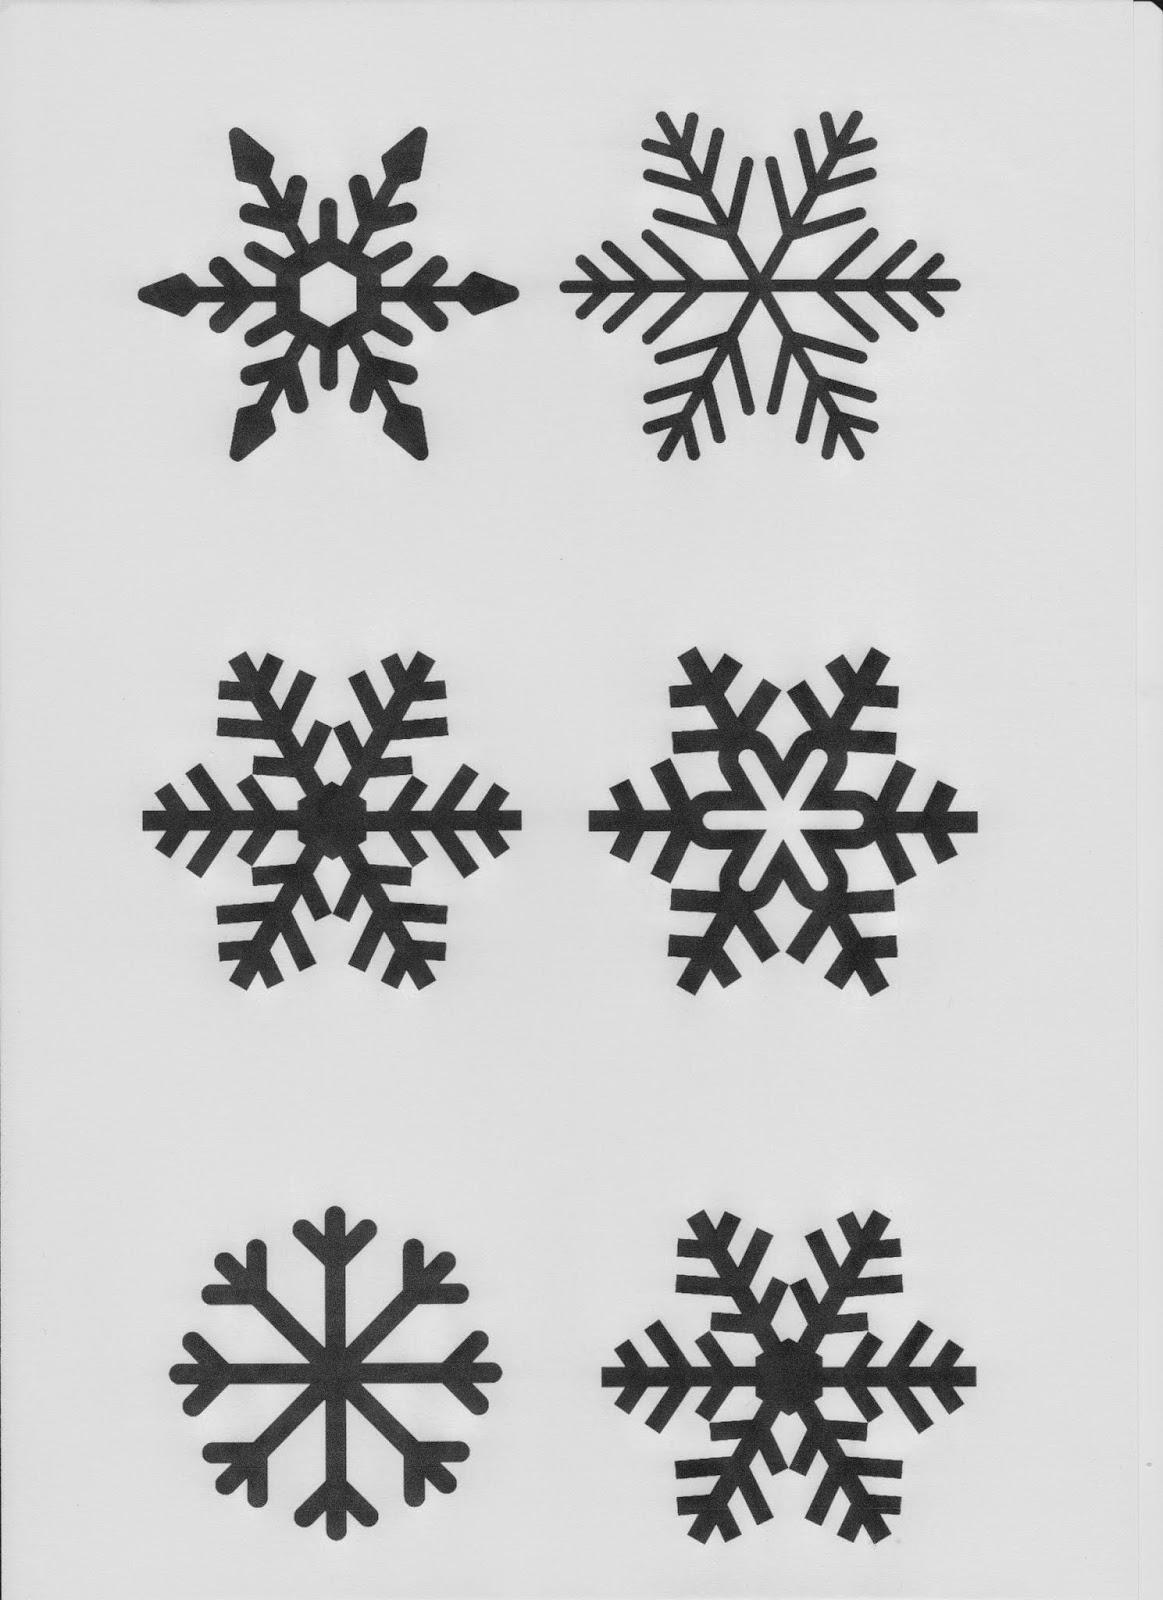 diy-snowflakes-10